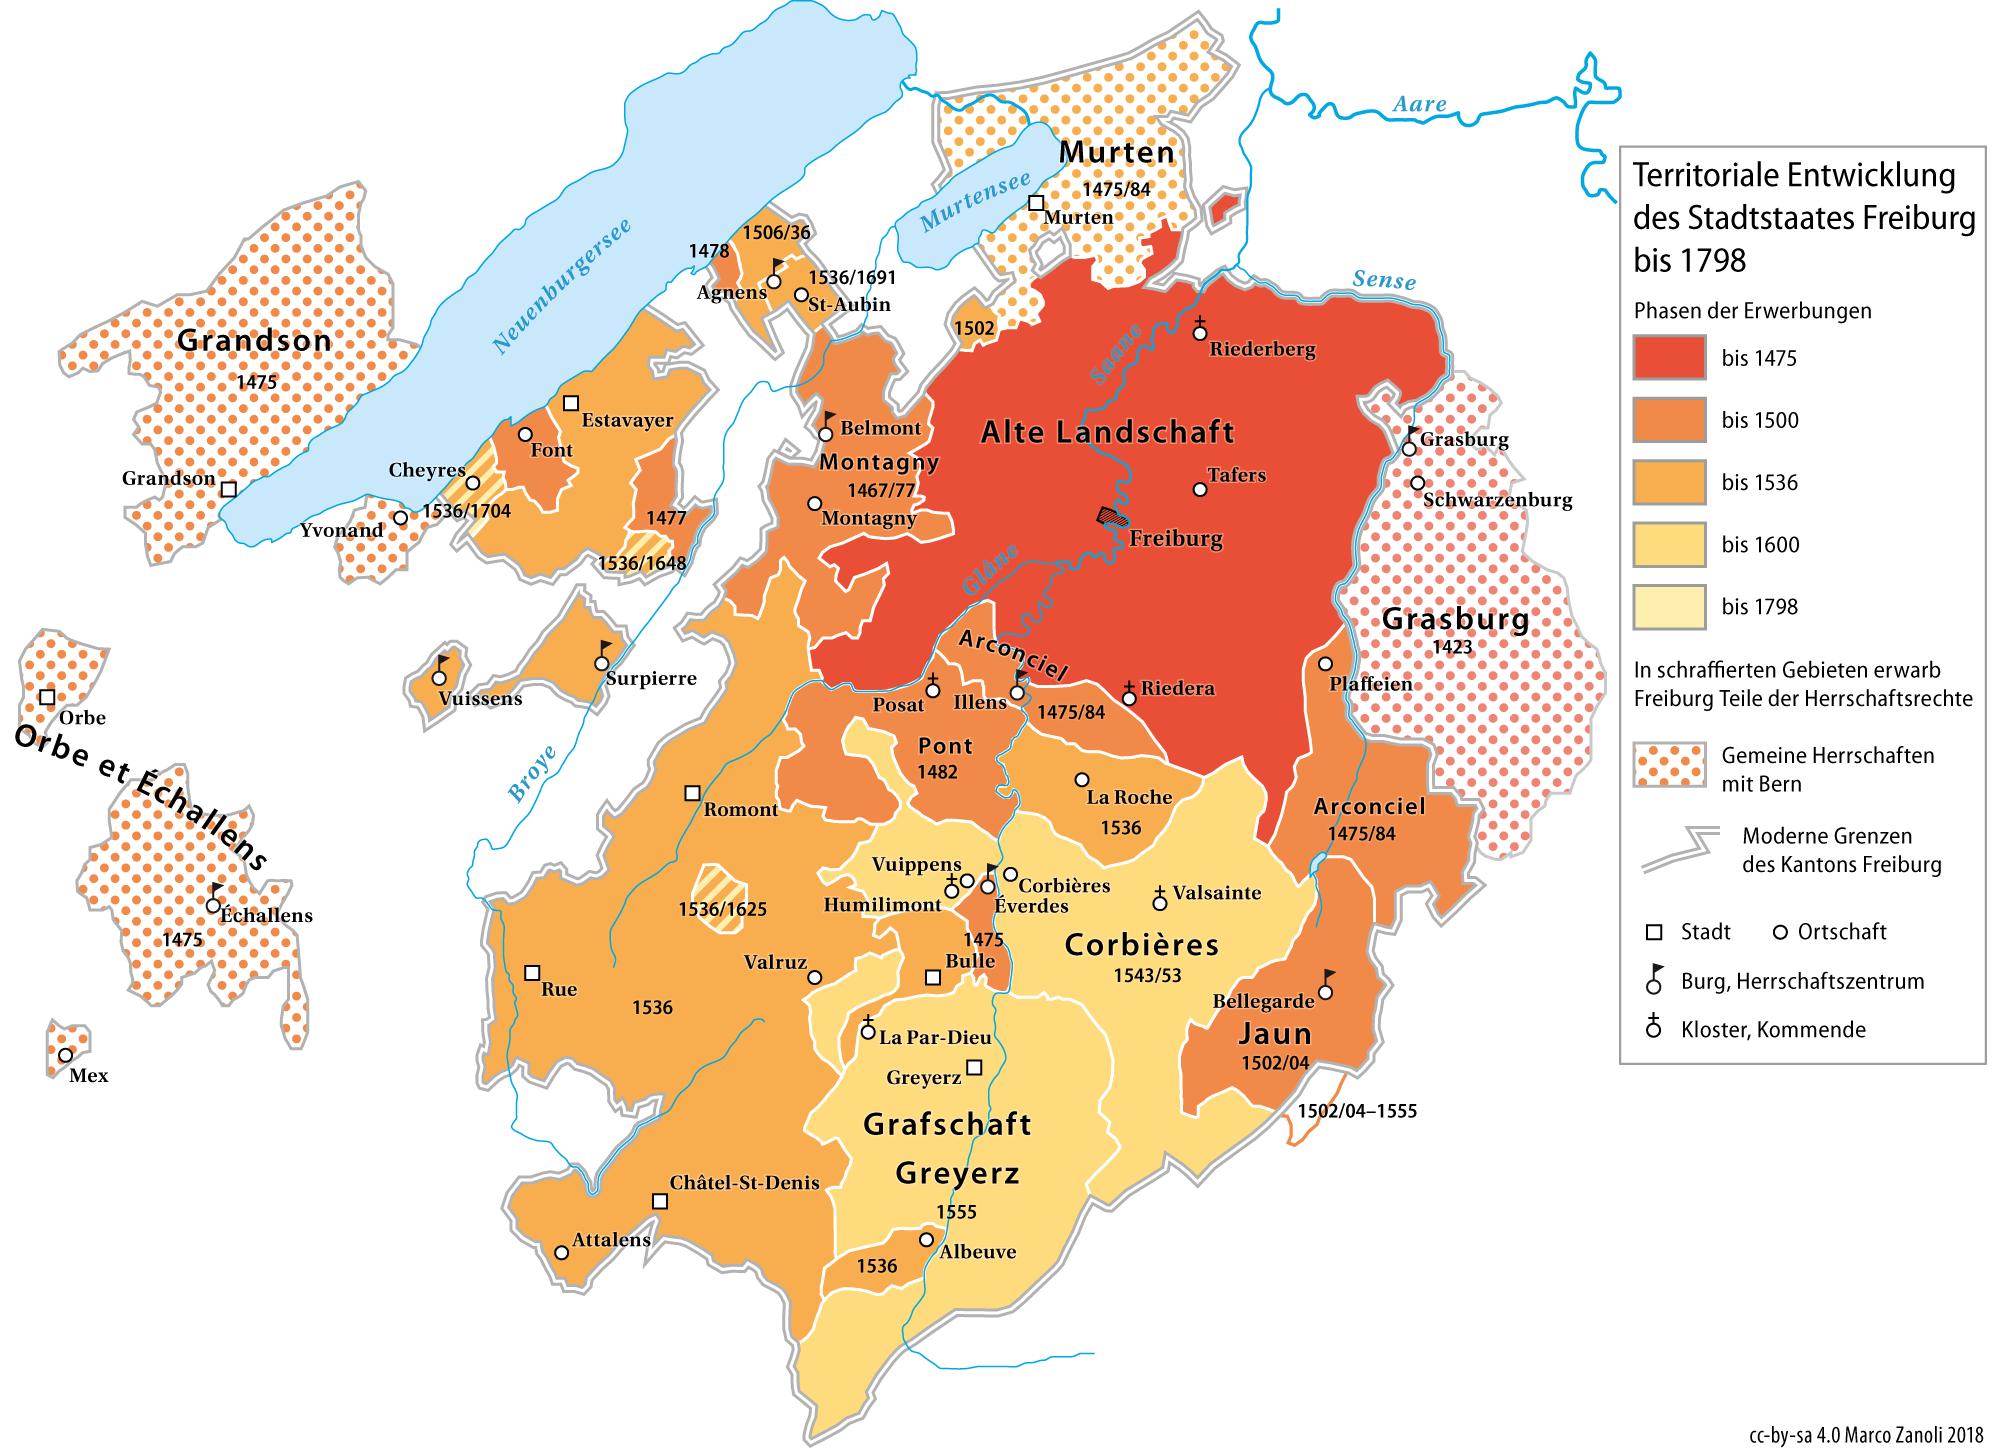 karte freiburg File:Historische Karte des Kantons Freiburg.png   Wikimedia Commons